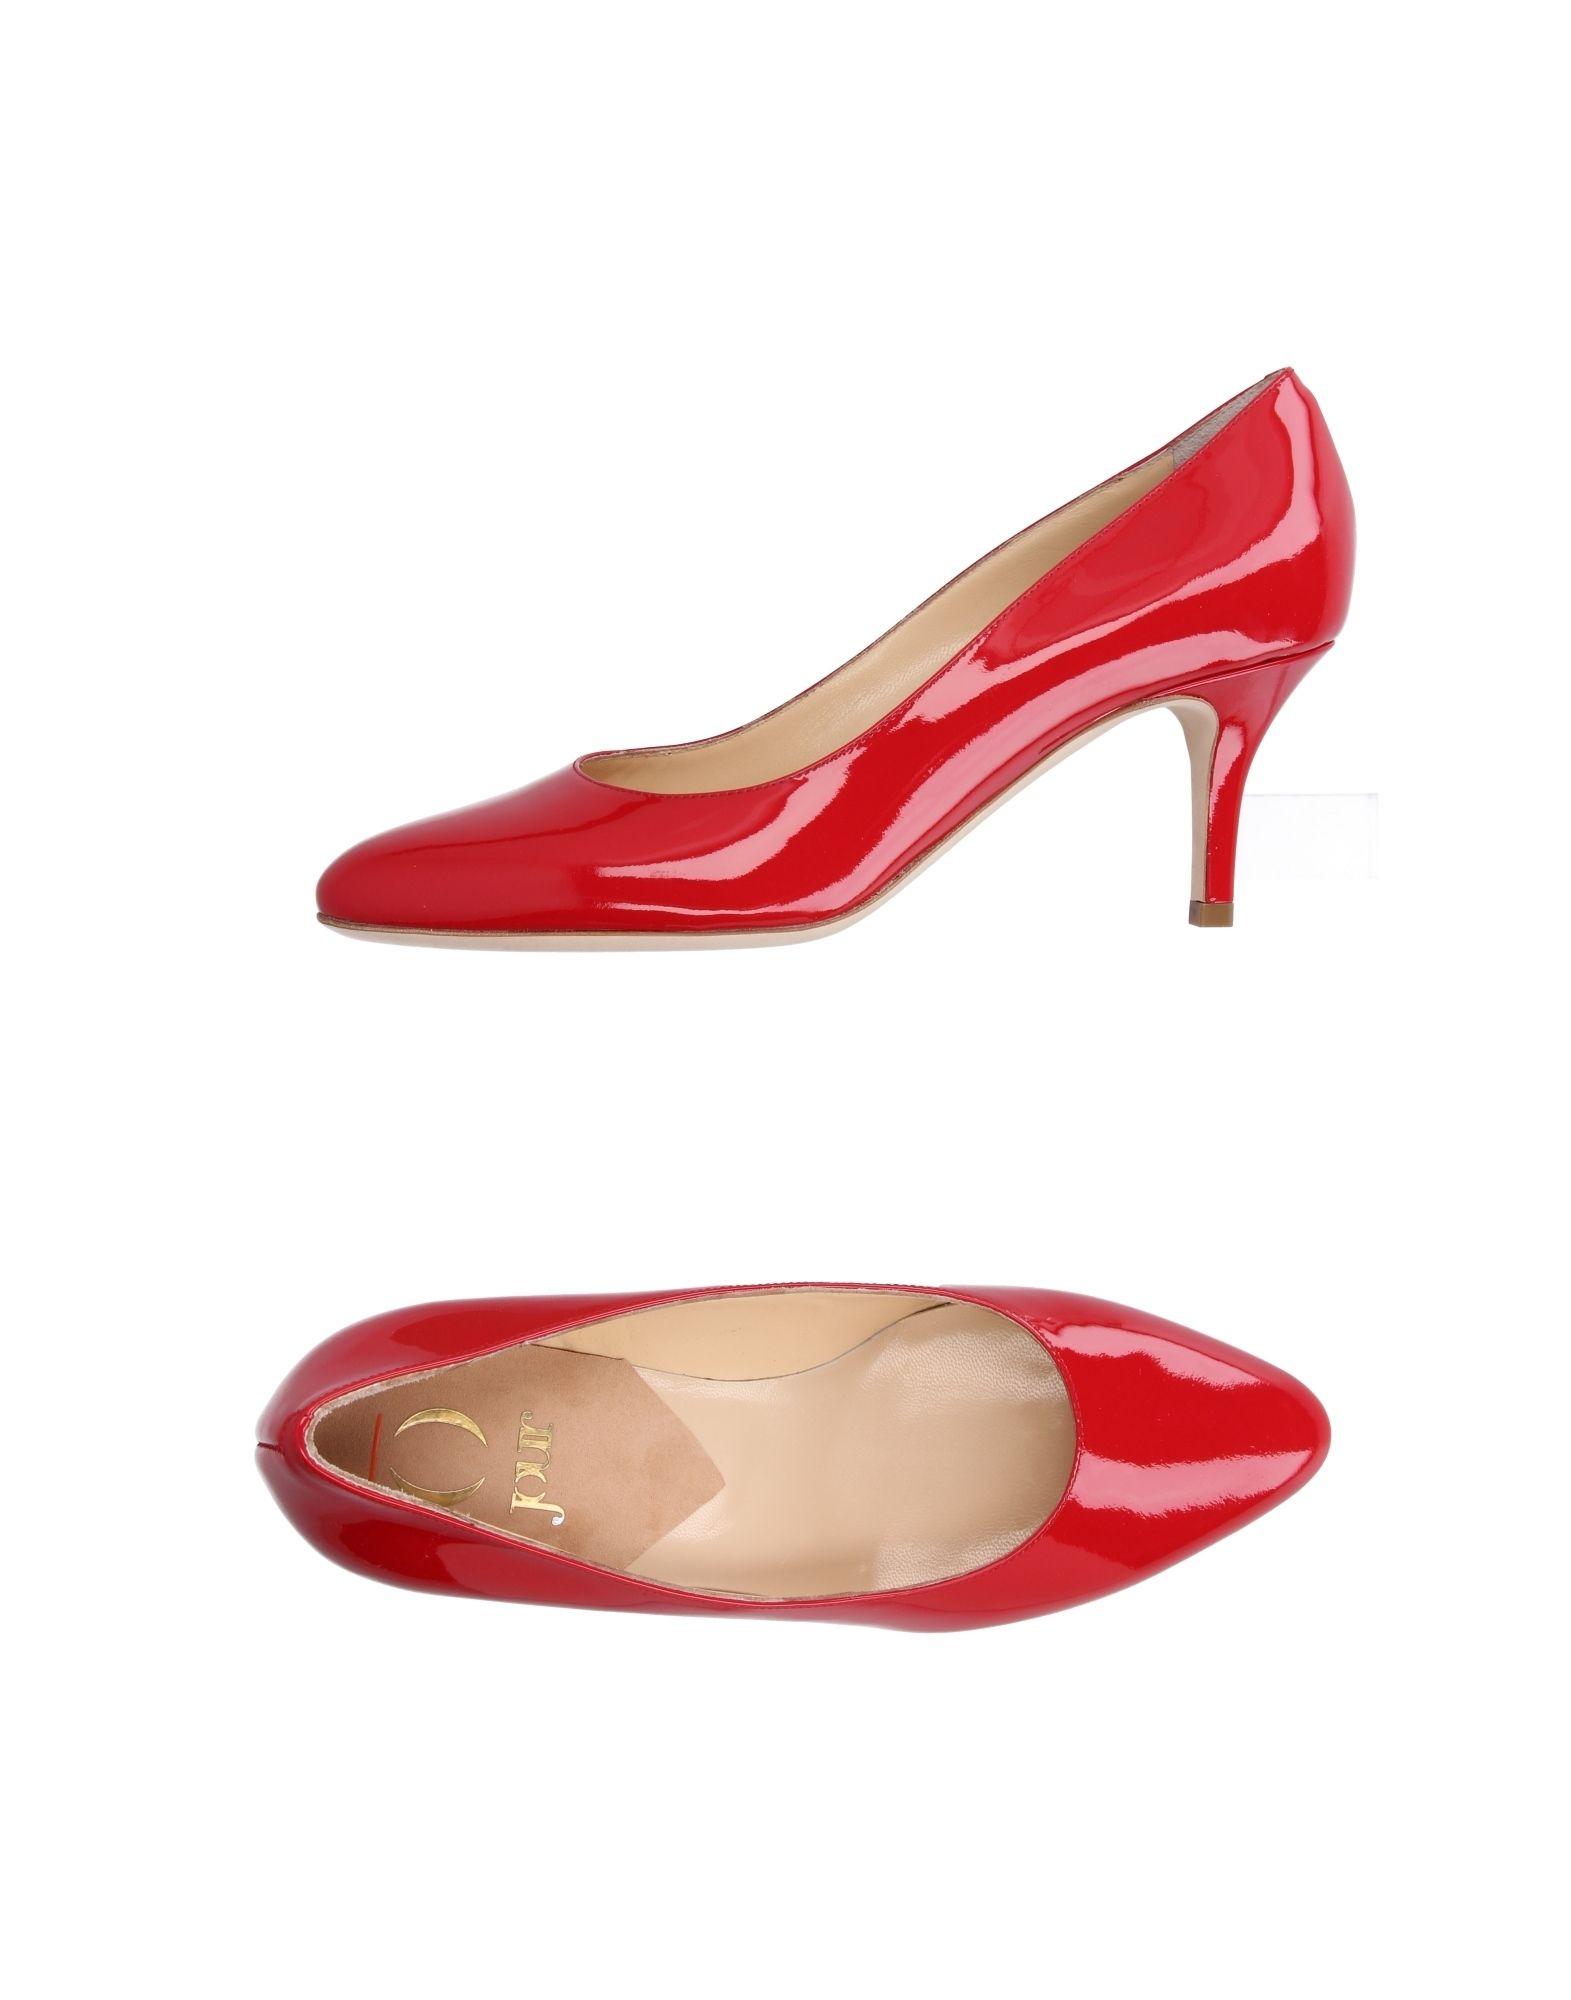 O JOUR Damen Pumps Farbe Rot Größe 7